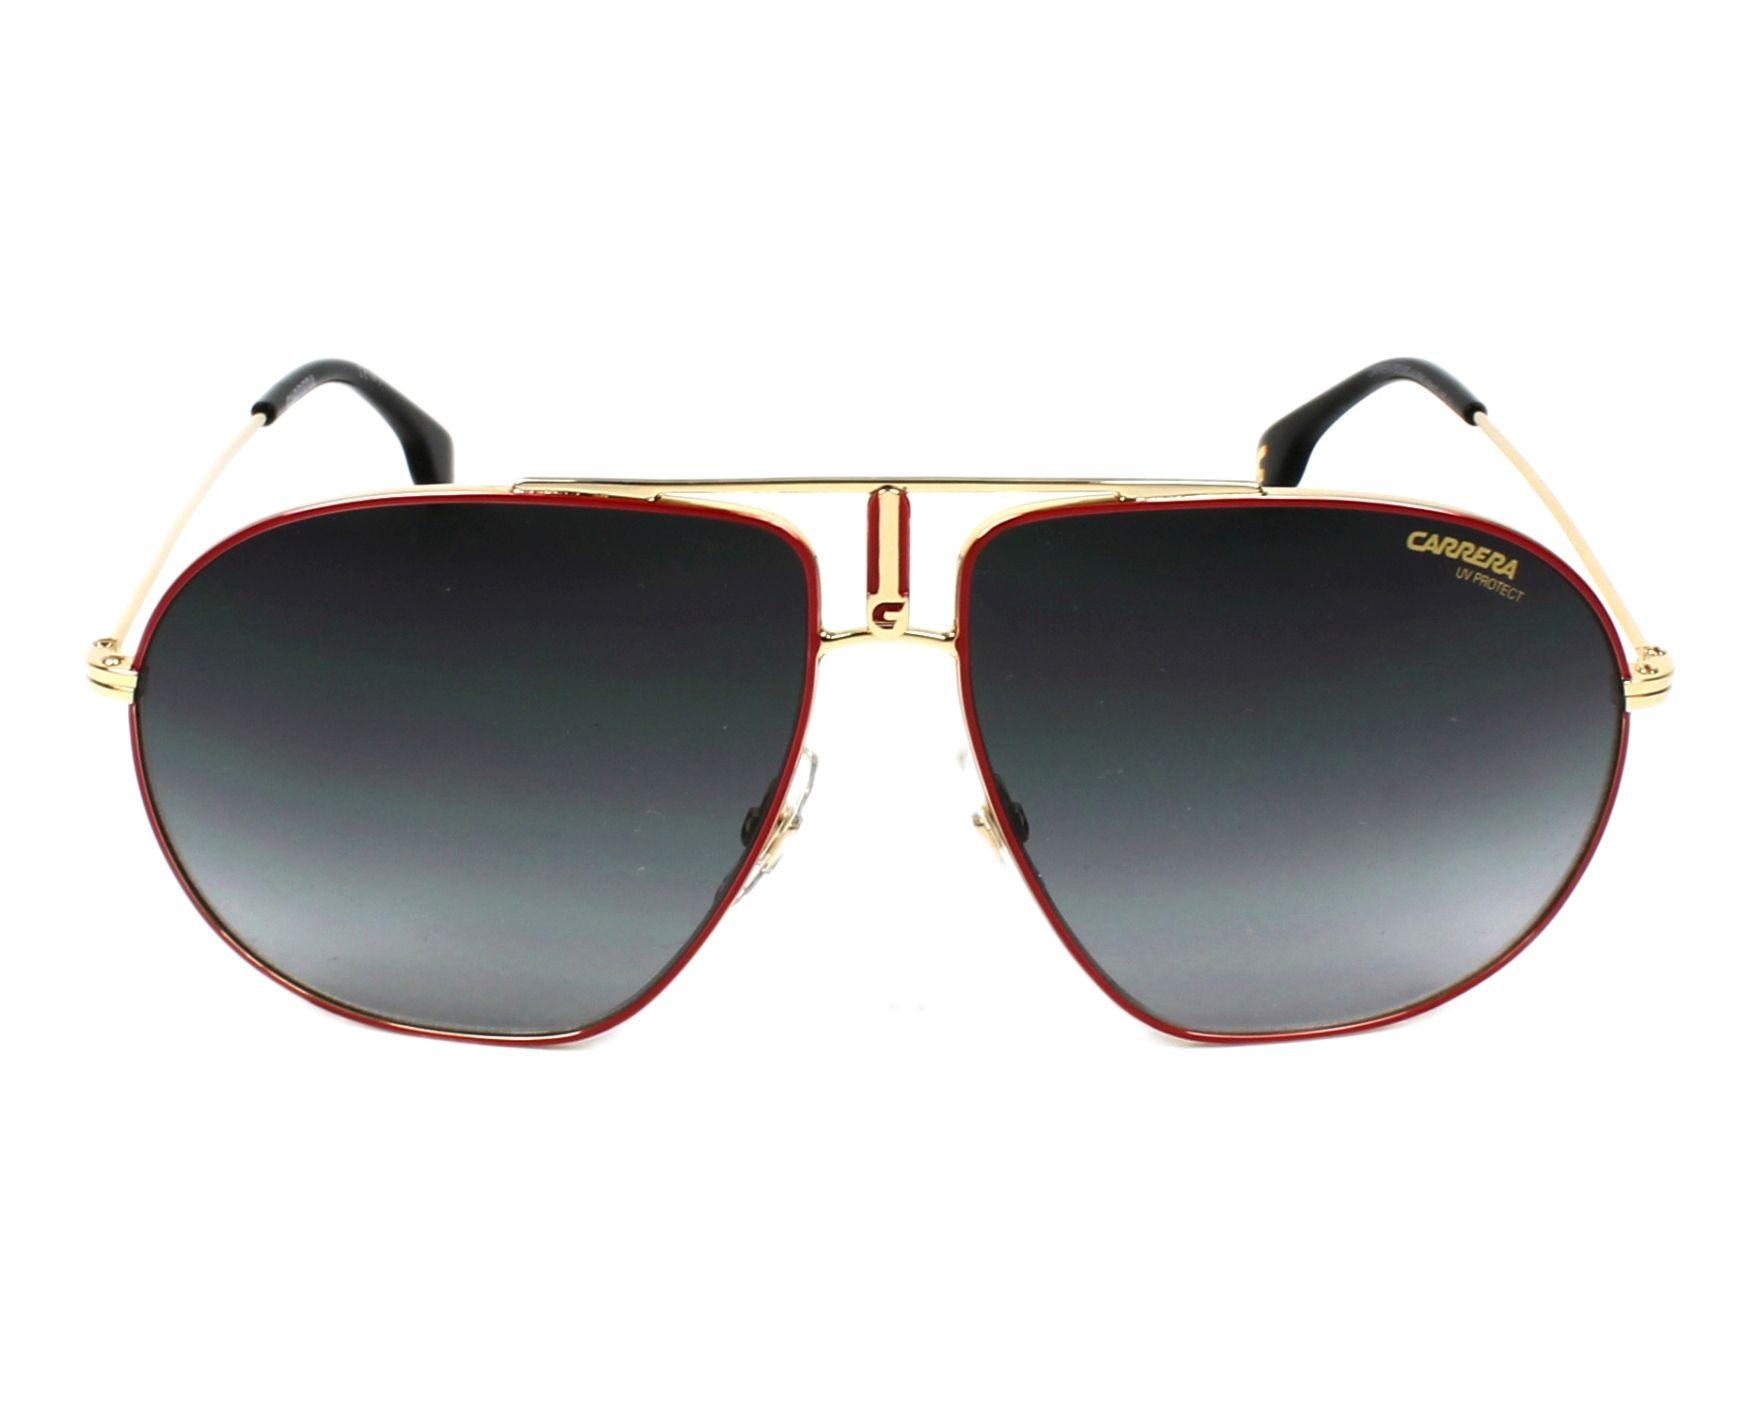 cc436fb86d Sunglasses Carrera BOUND AU2 9O 60-12 Red Gold front view